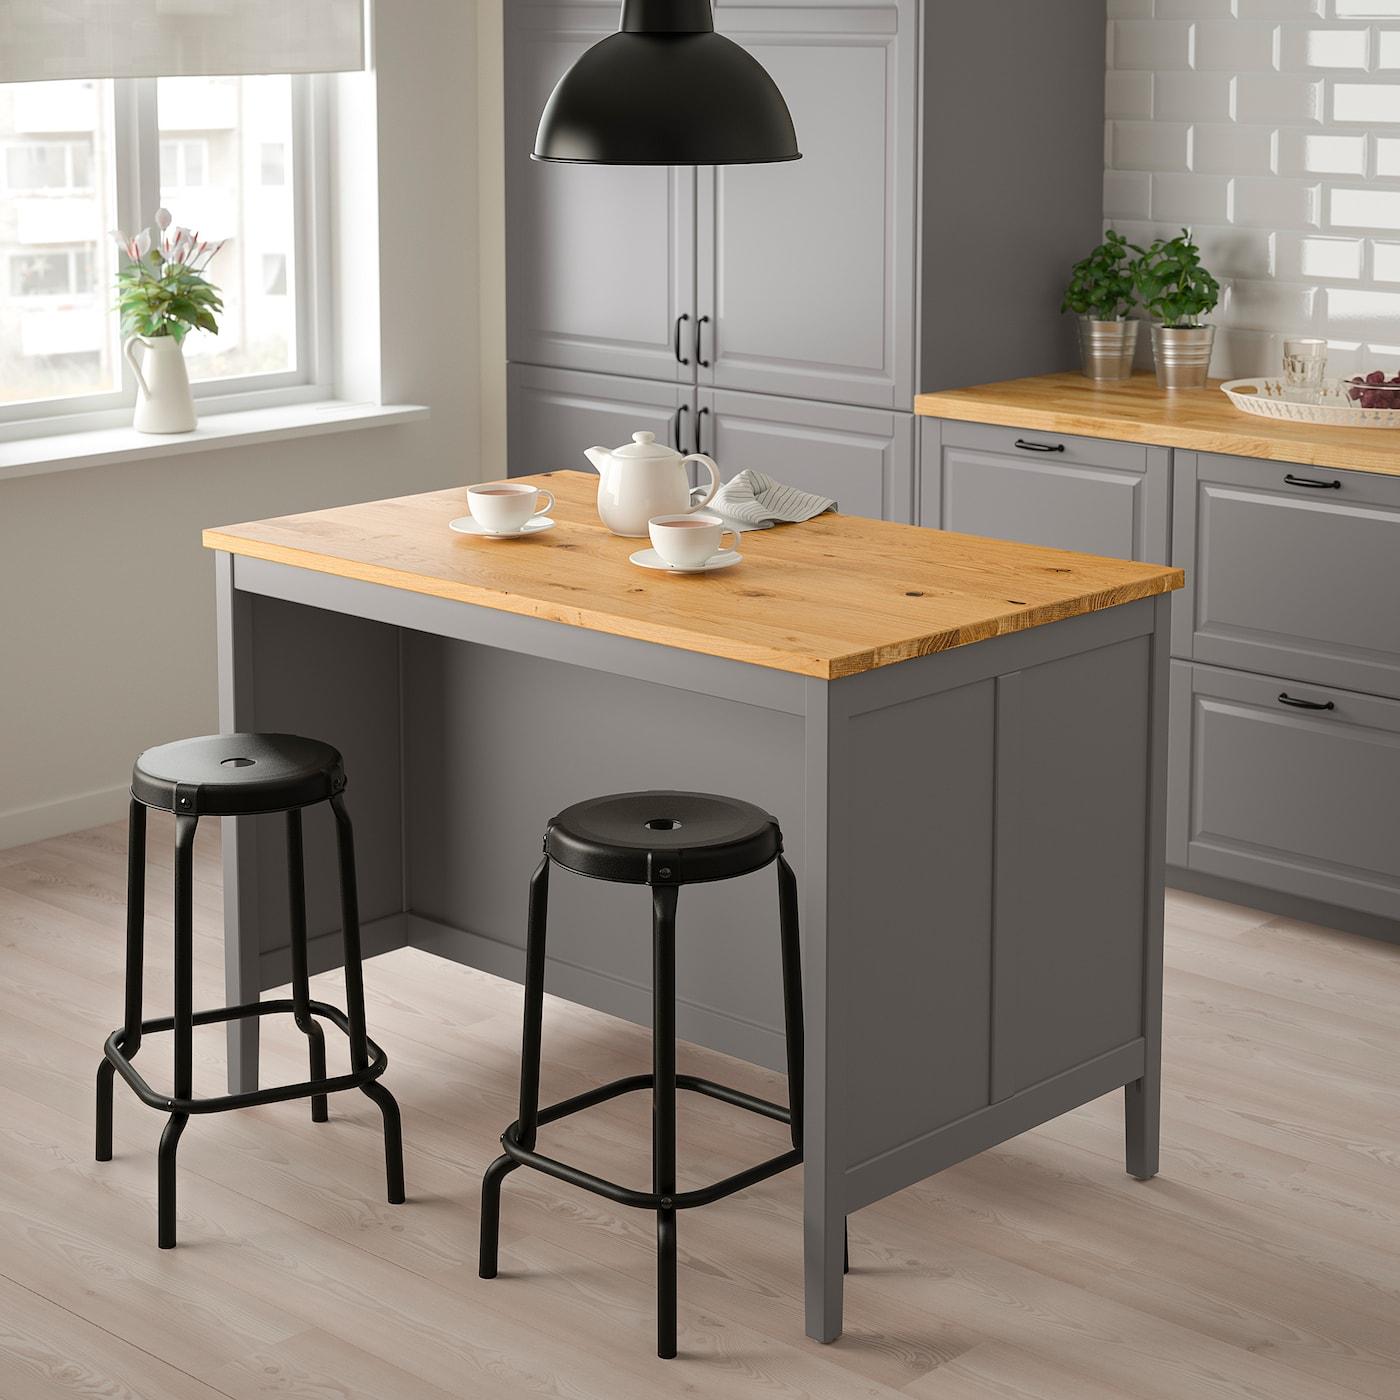 TORNVIKEN Kitchen island, grey/oak, 126x77 cm